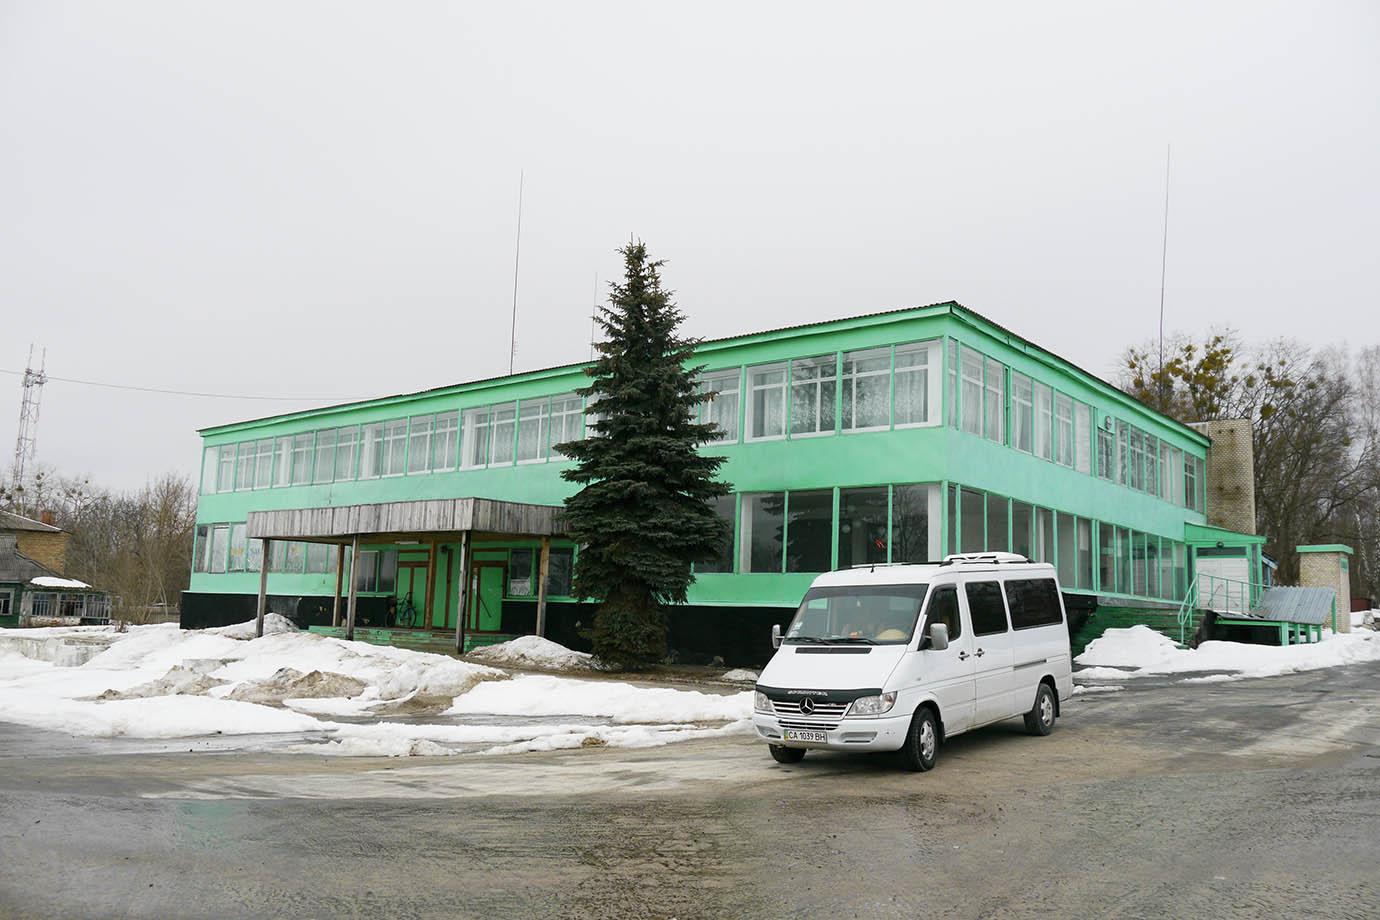 chernobyl-cafeteria40